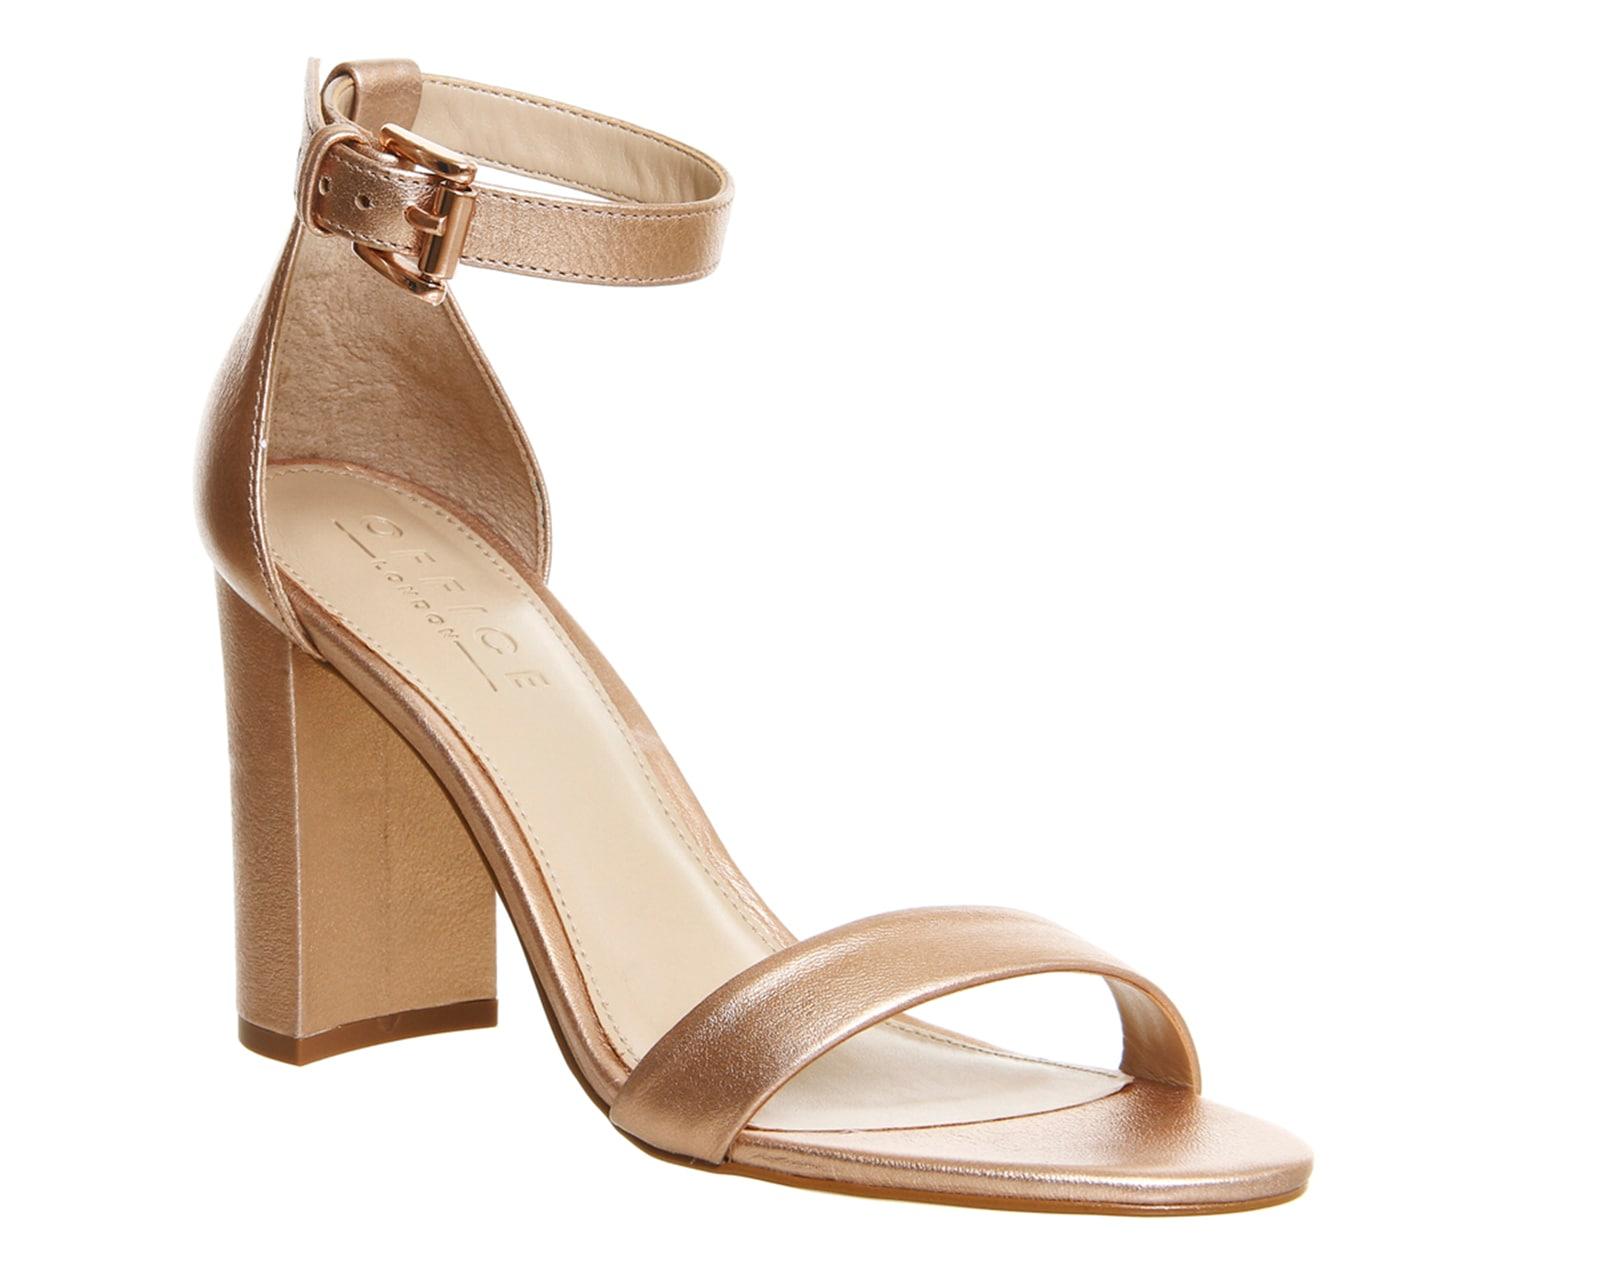 Womens-Office-Nina-Block-Heel-Sandals-ROSE-GOLD-